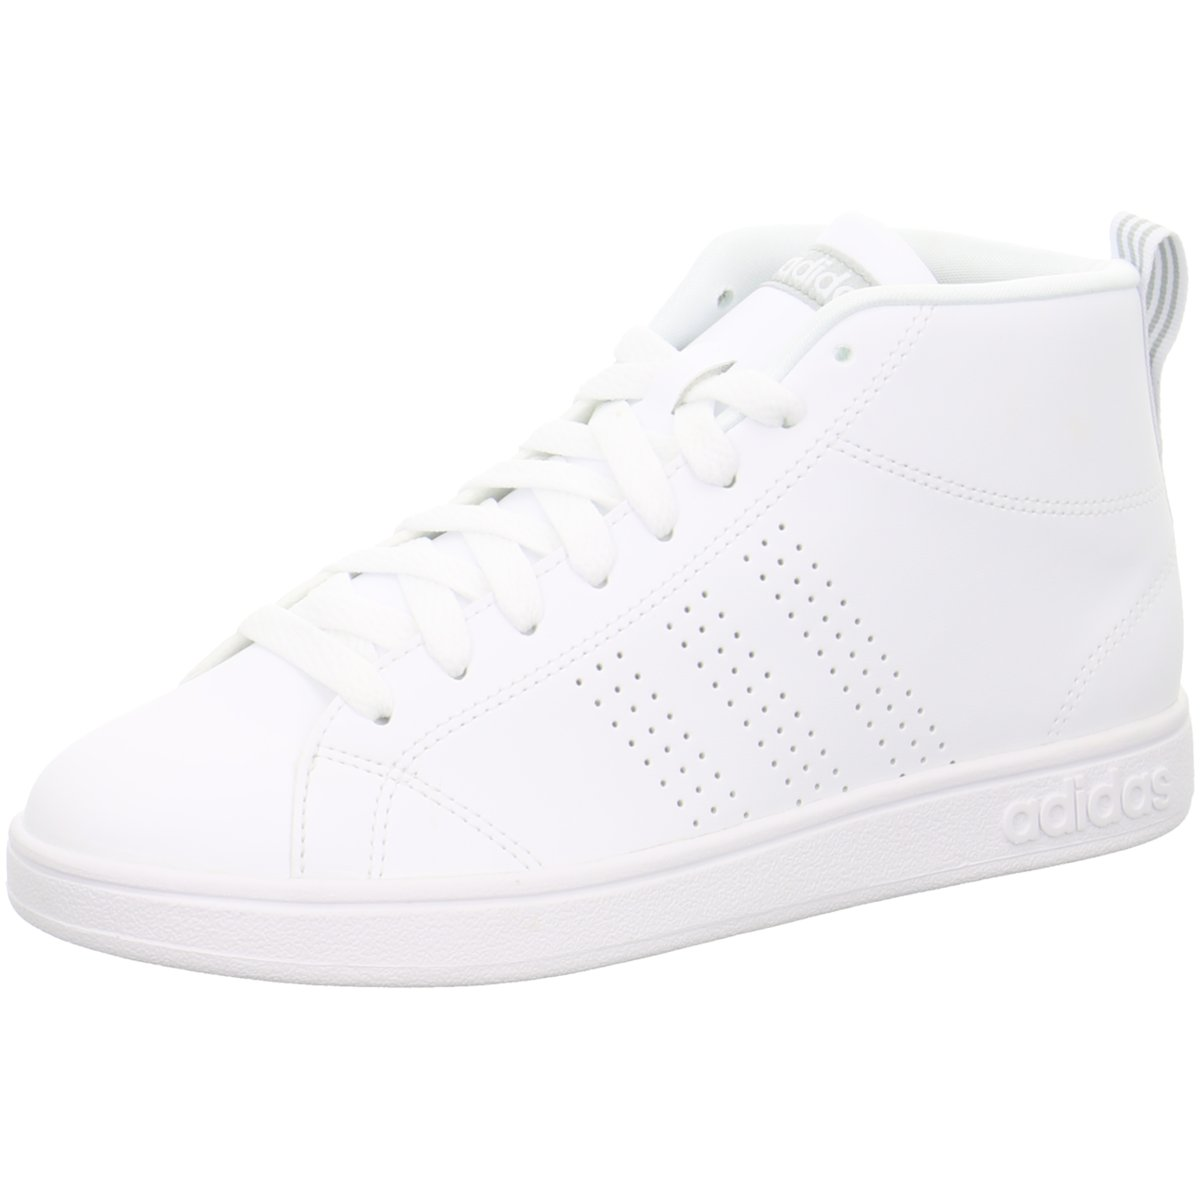 NEU adidas Damen Sneaker Sneaker High Bdvantage CL MID W BB9983 weiß 340034